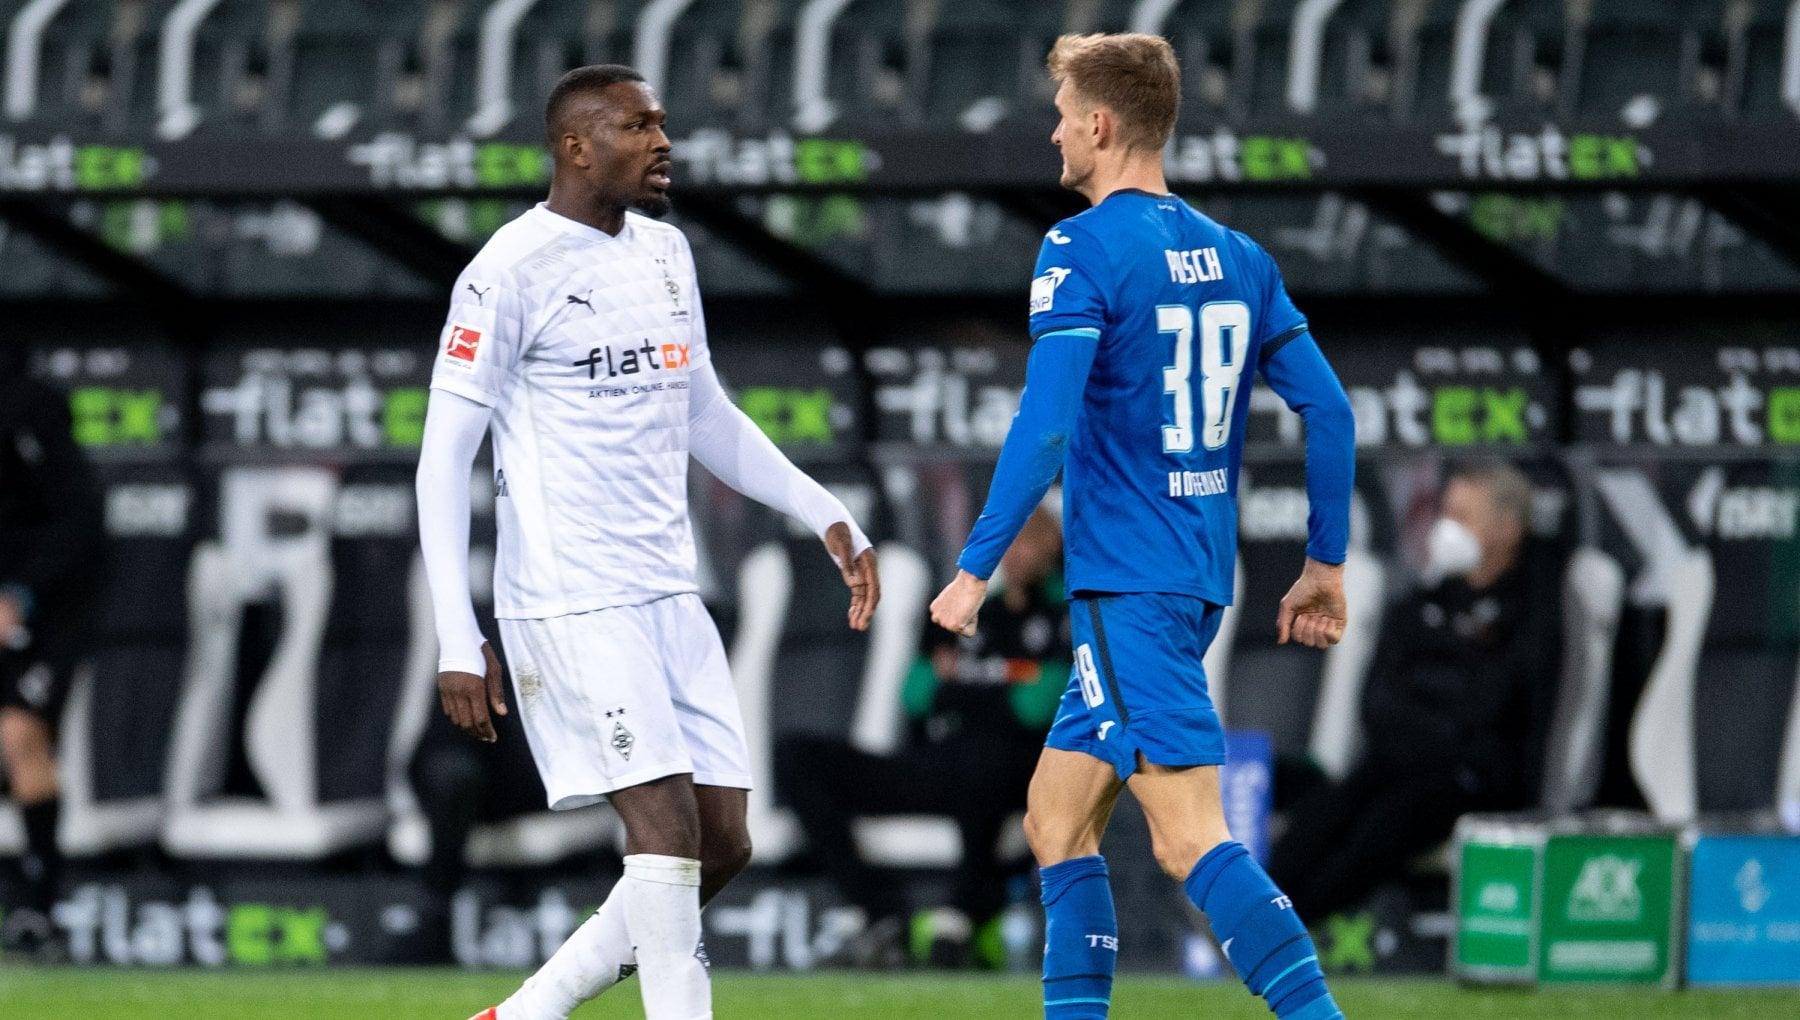 Borussia Moenchengladbach Thuram jr sputa in faccia a un avversario espulso